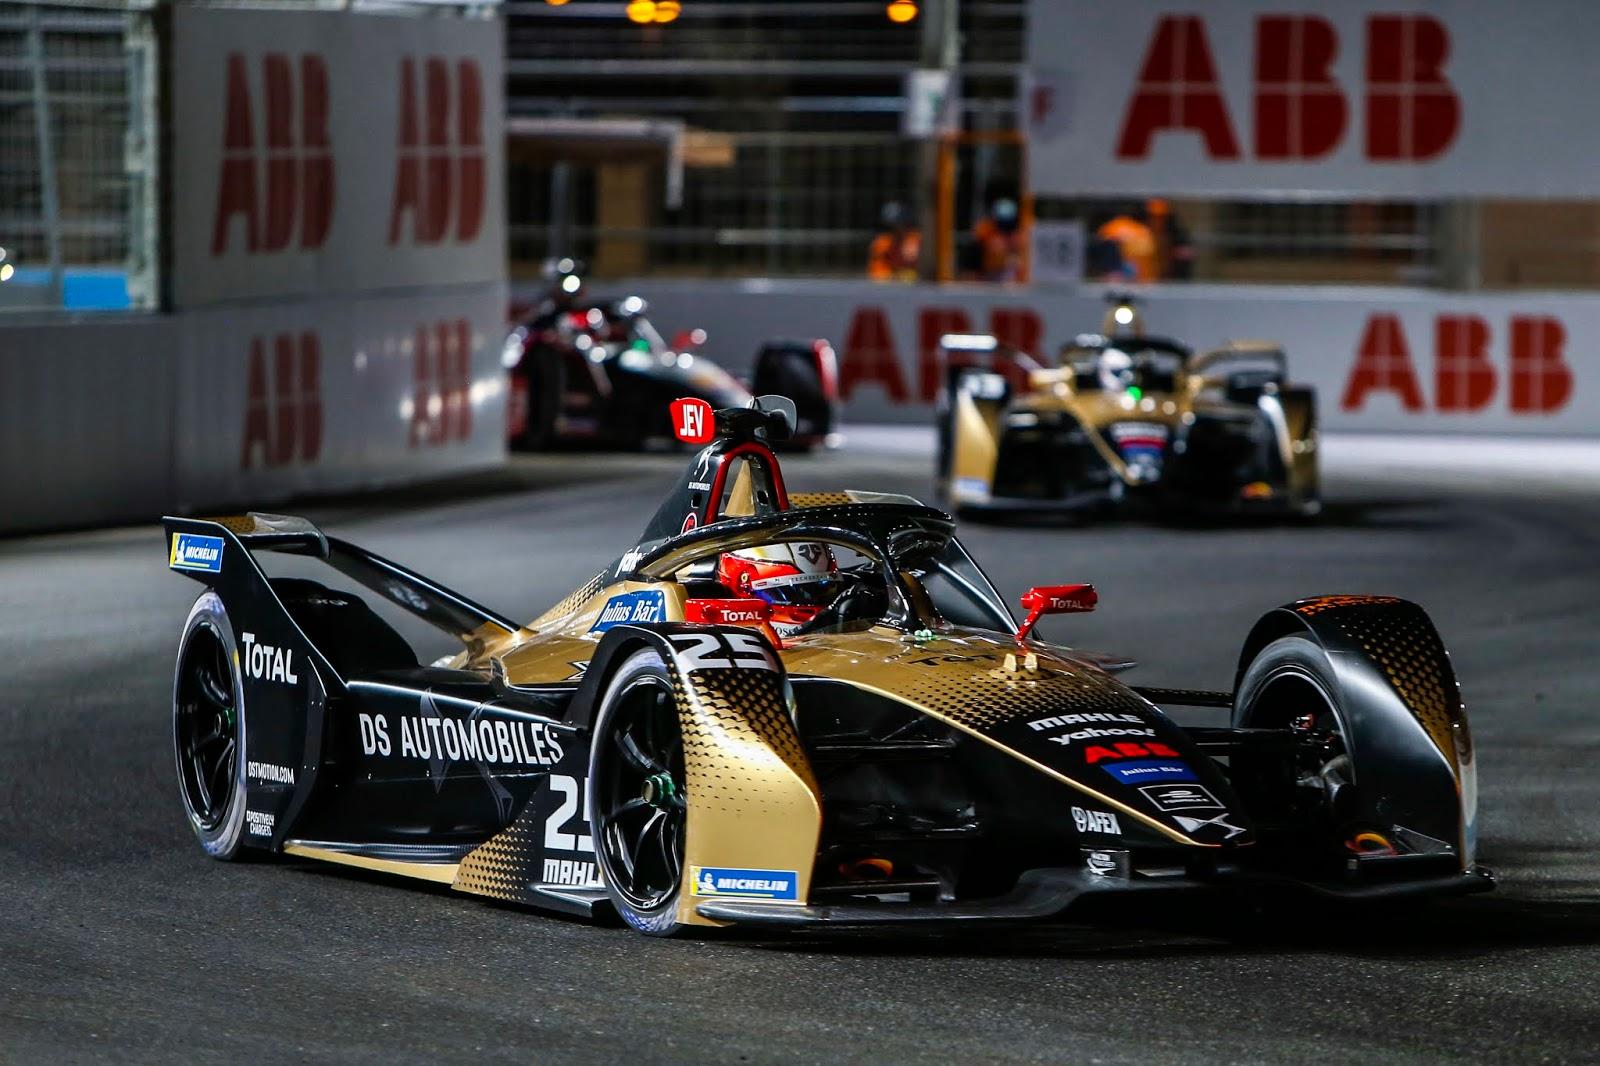 DS2BE TENSE2BFE21 1 Ντεμπούτο Για Το Νέο Μονοθέσιο Της DS AUTOMOBILES, Στο E-PRIX Της Ρώμης DS Automobiles, E-Prix, Formula, Formula E, αγωνες, ειδήσεις